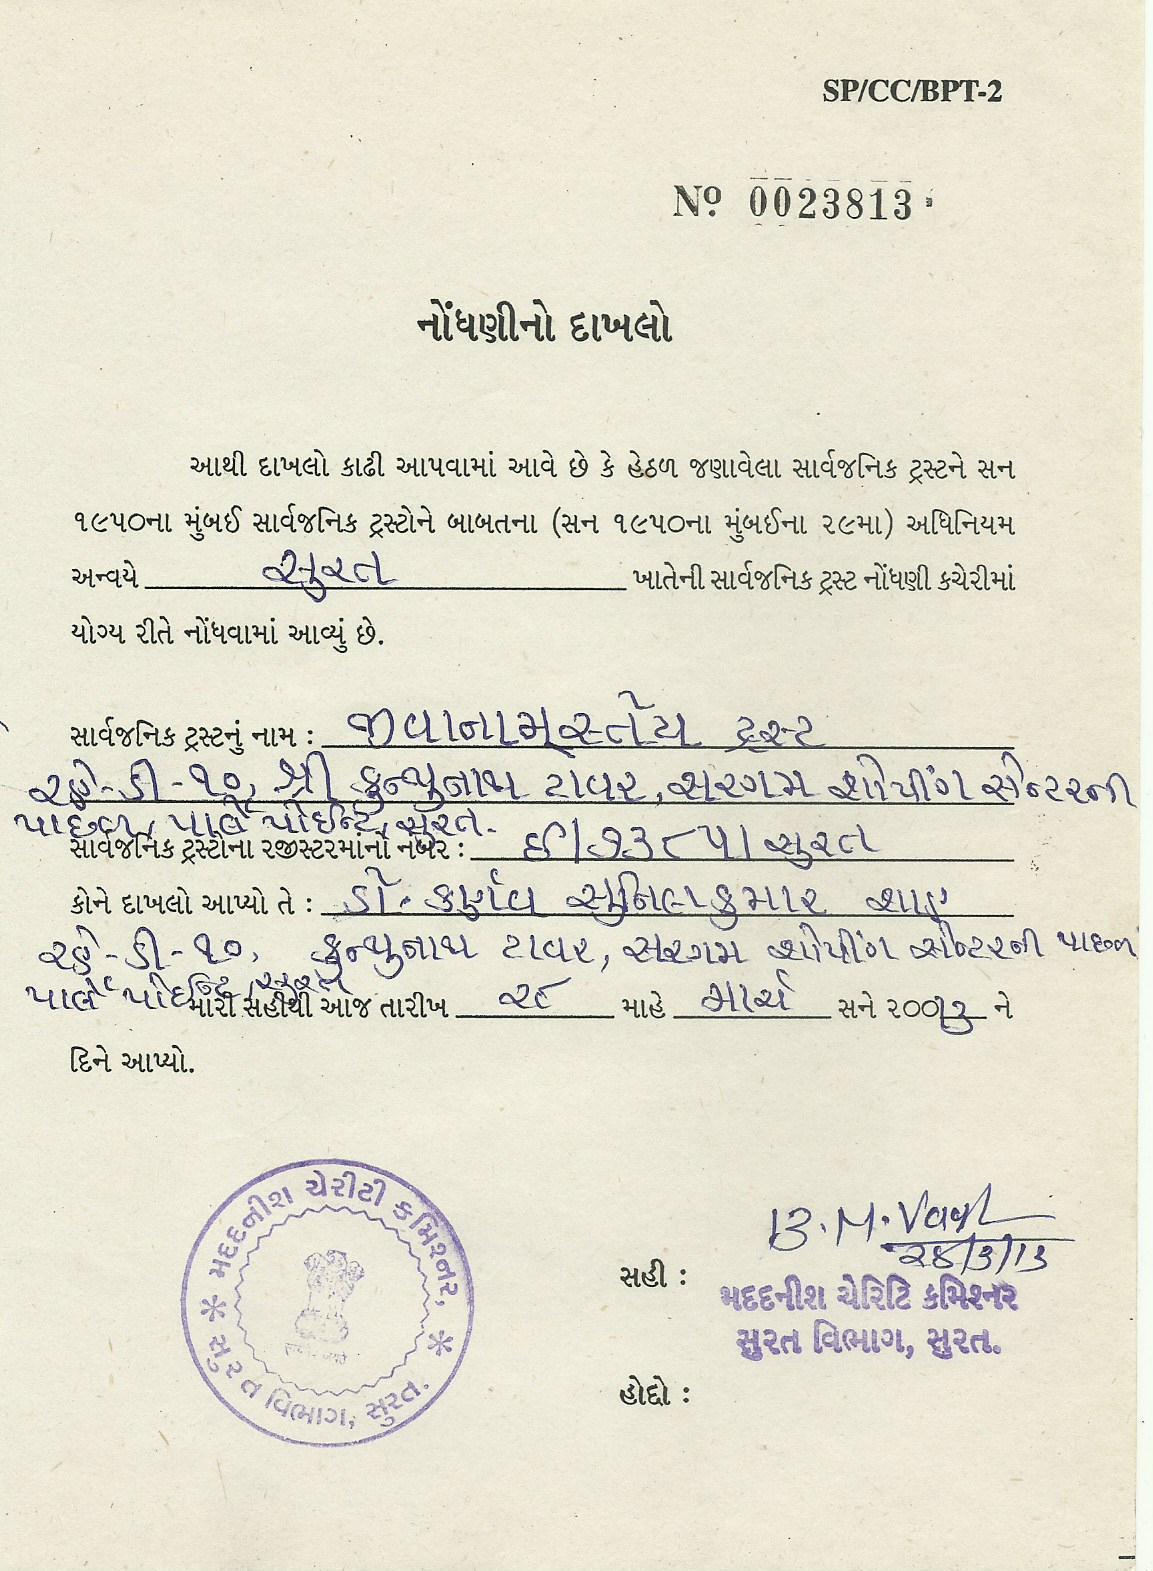 Jivanamasteya accreditation registration trust registration certificate thecheapjerseys Image collections